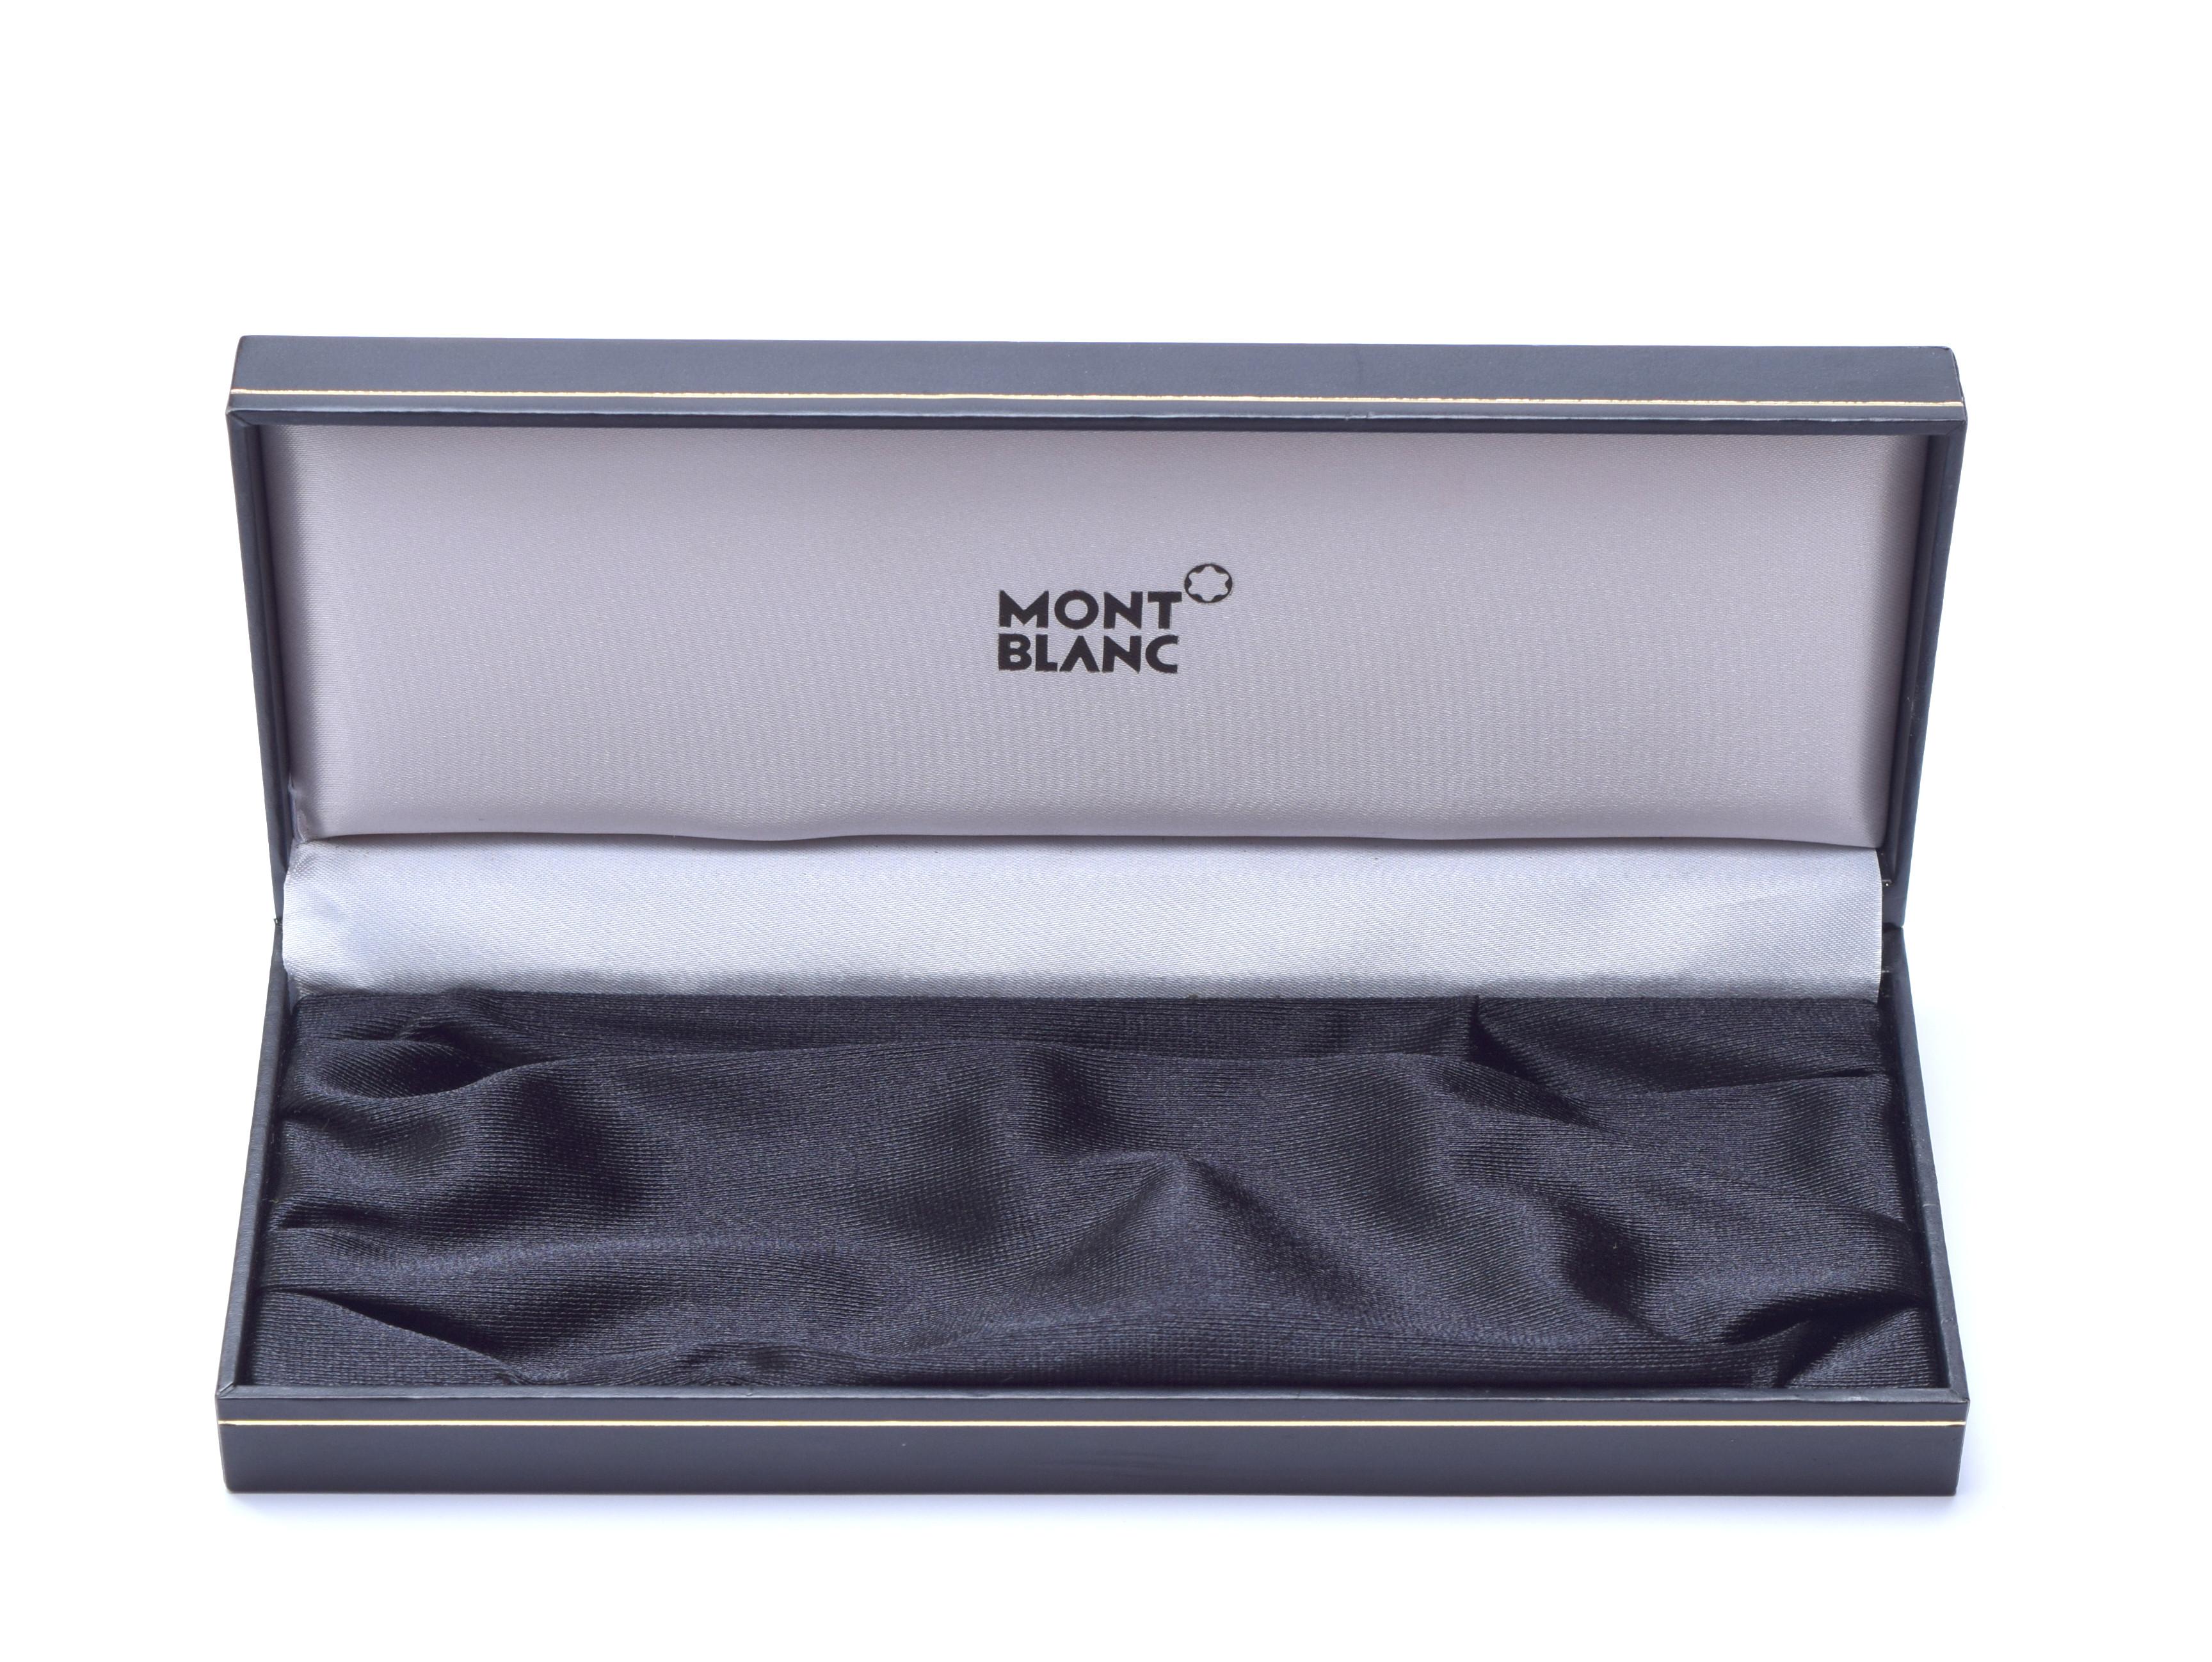 a5c60b866f3f Pen Box, Pen Gift Boxes, Pen Display Boxes